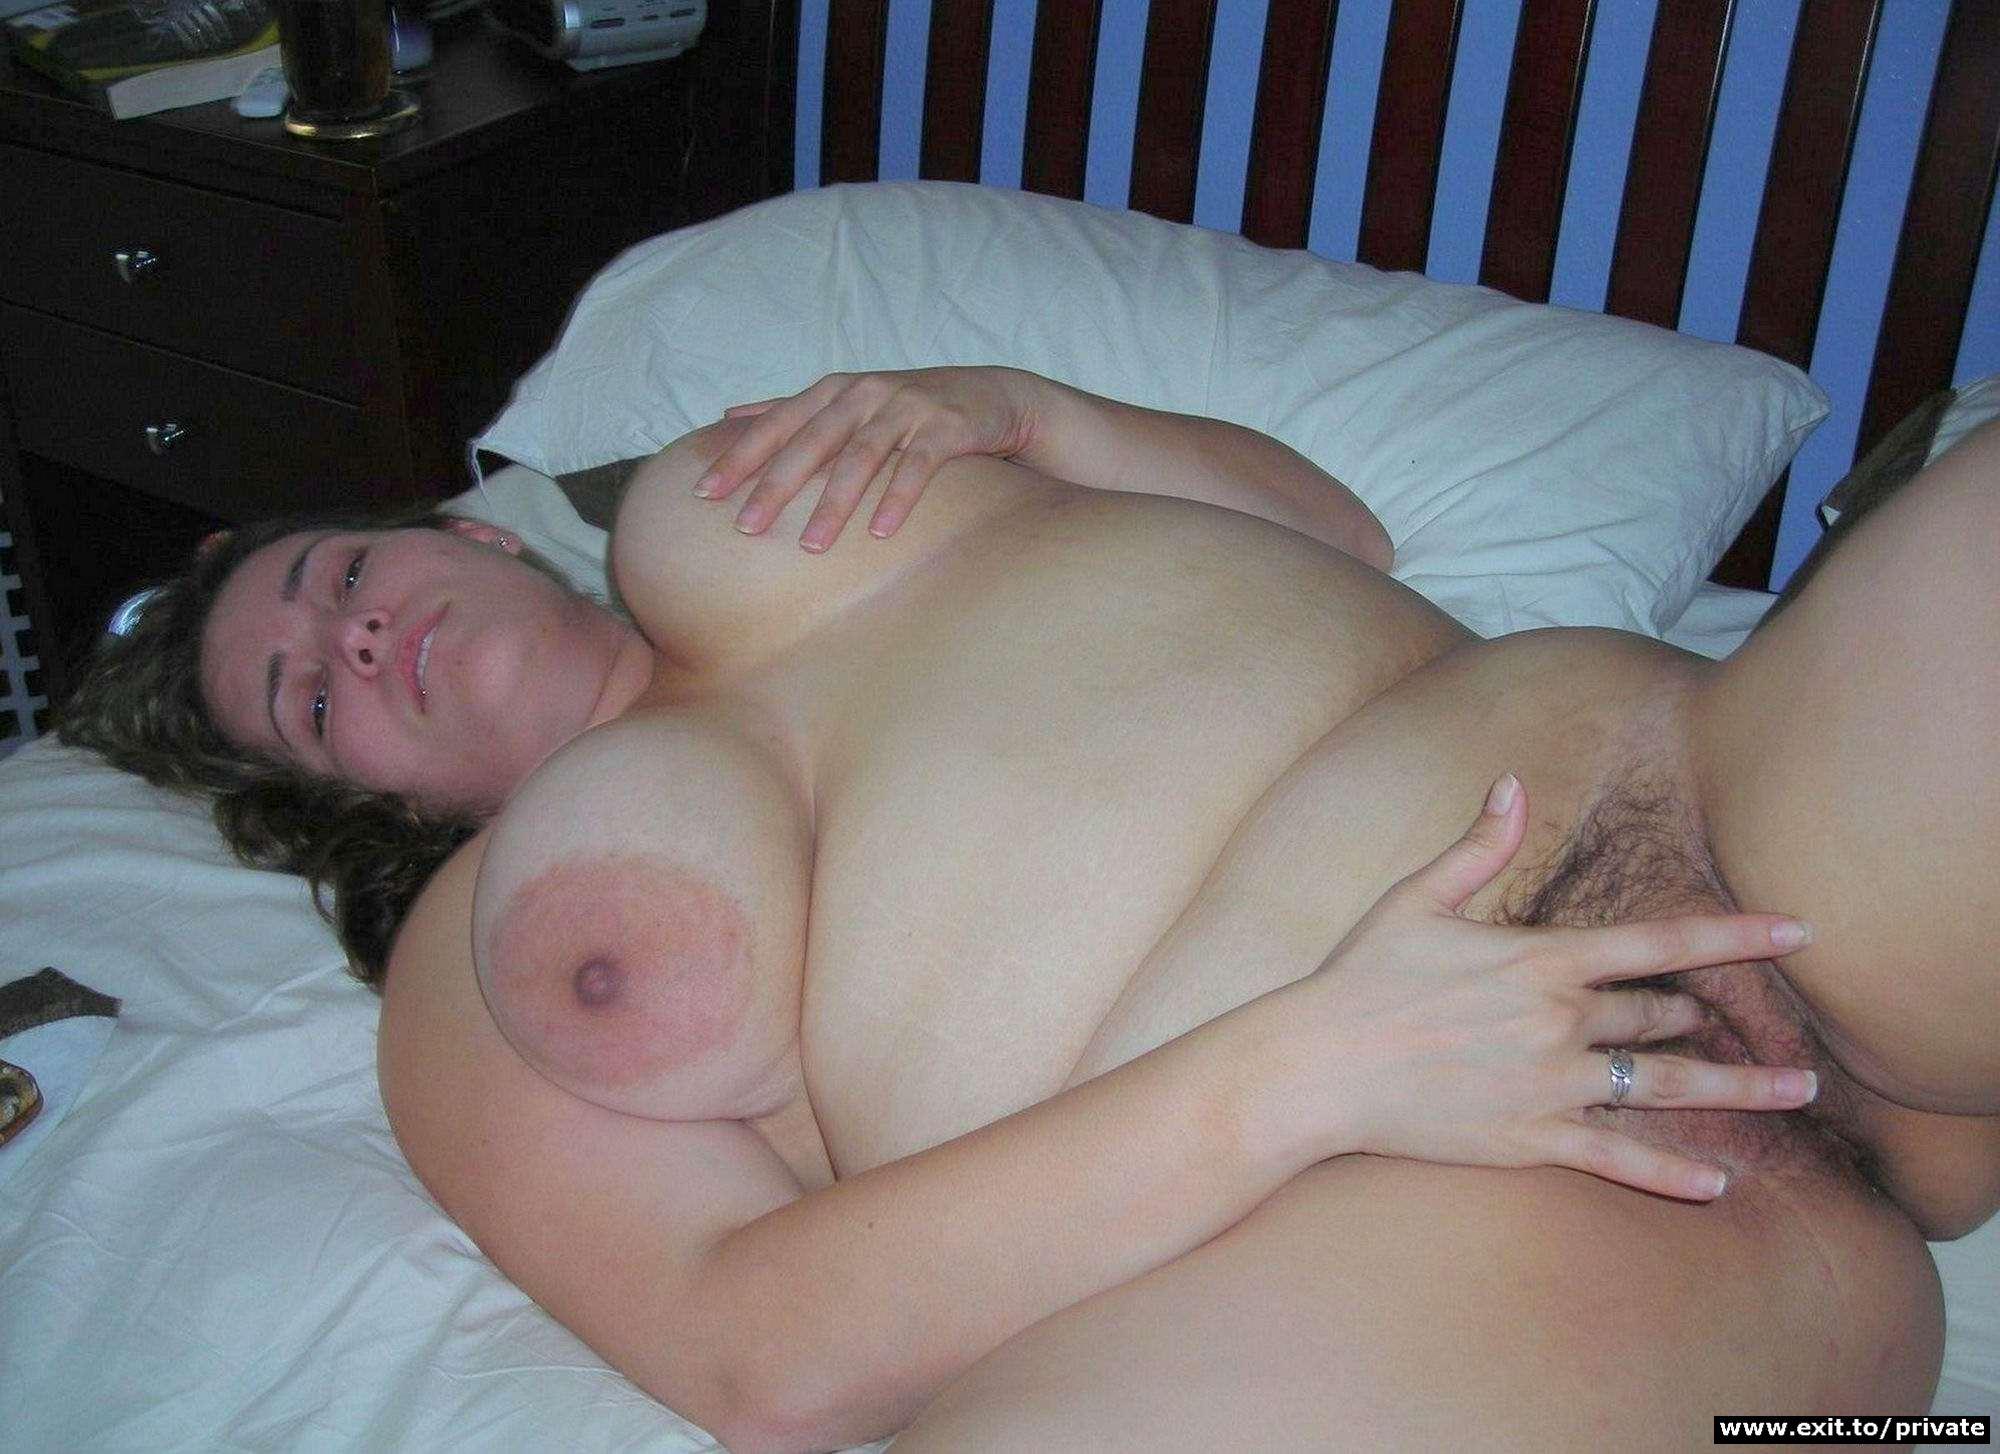 Sexest wimen of scifi nude pics adult clips